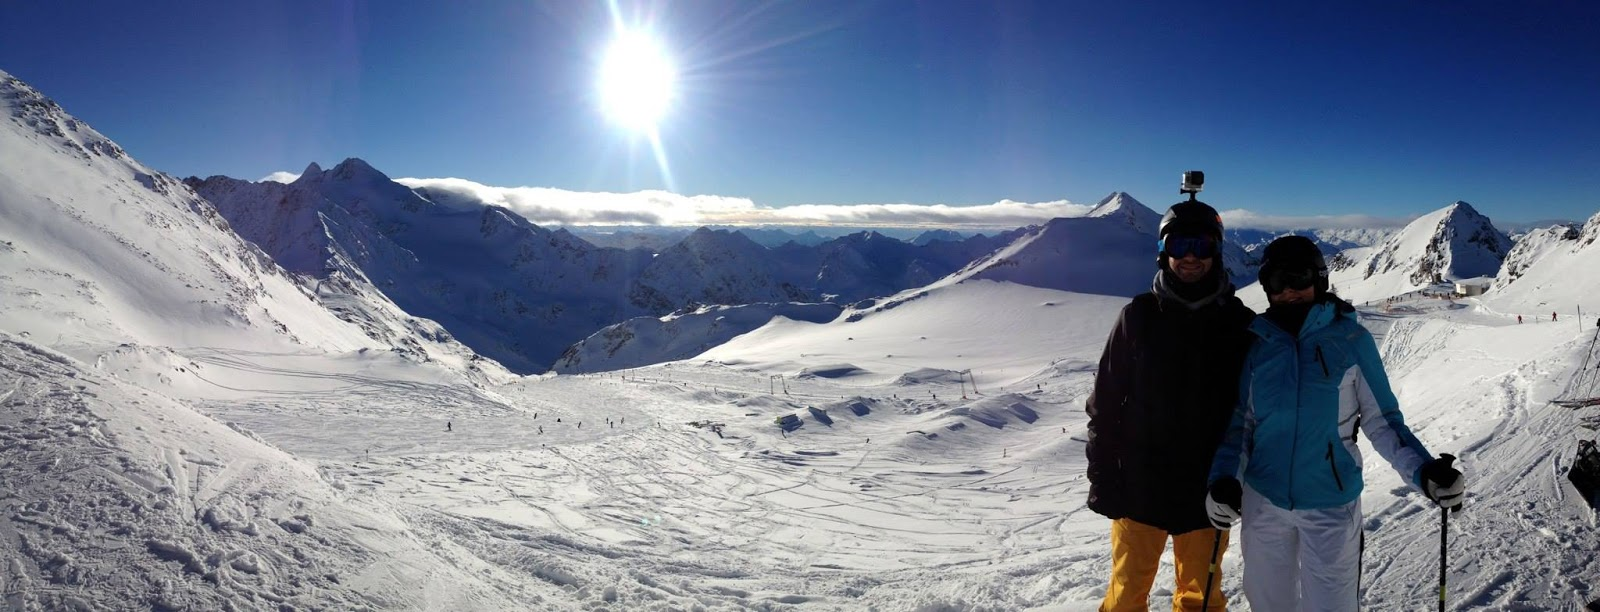 Skiing (Stubai glacier and Patscherkofel)  63aa299e343